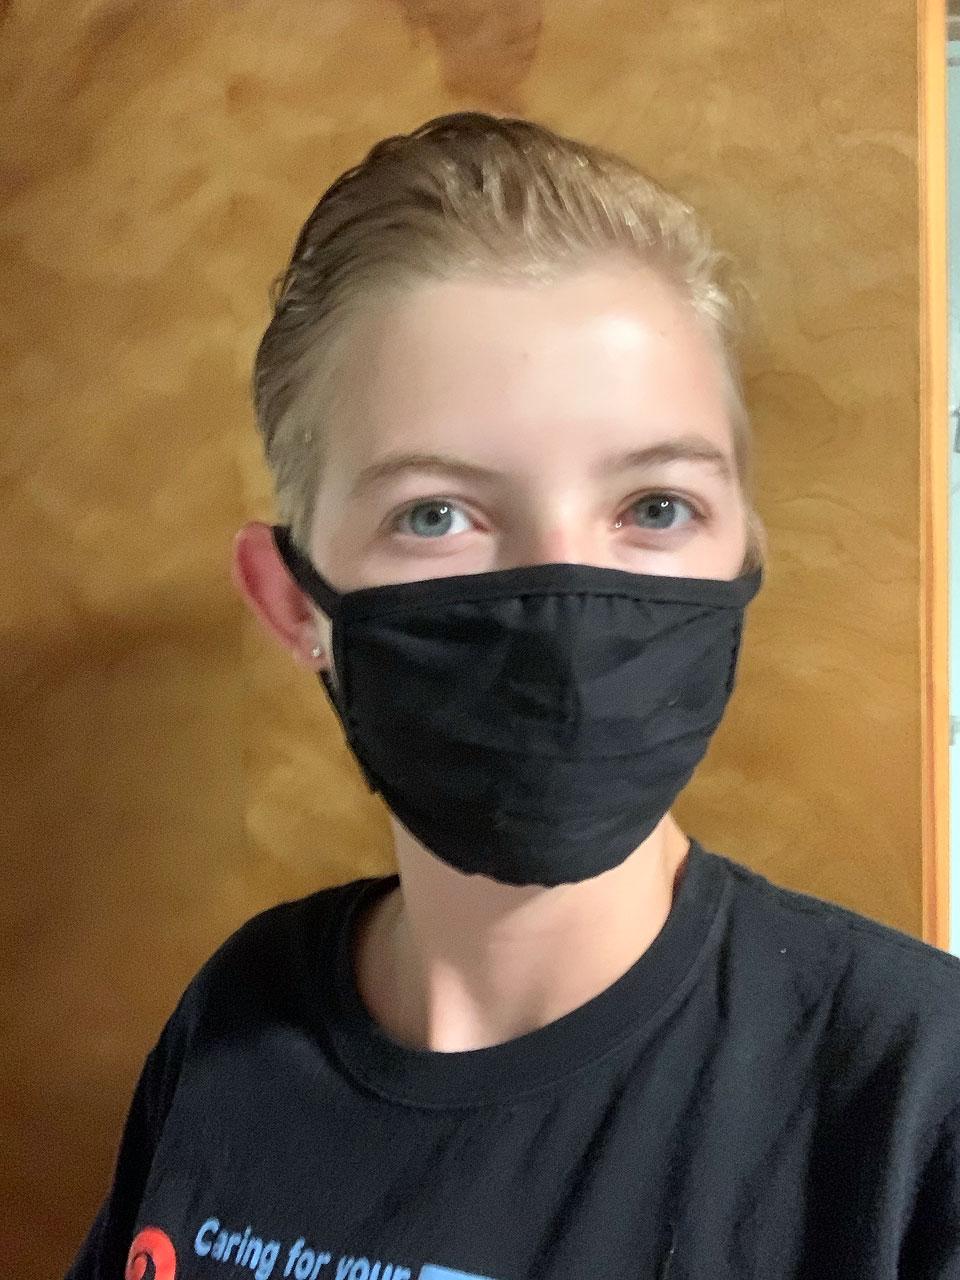 Shelby Jensen shares a mask selfie